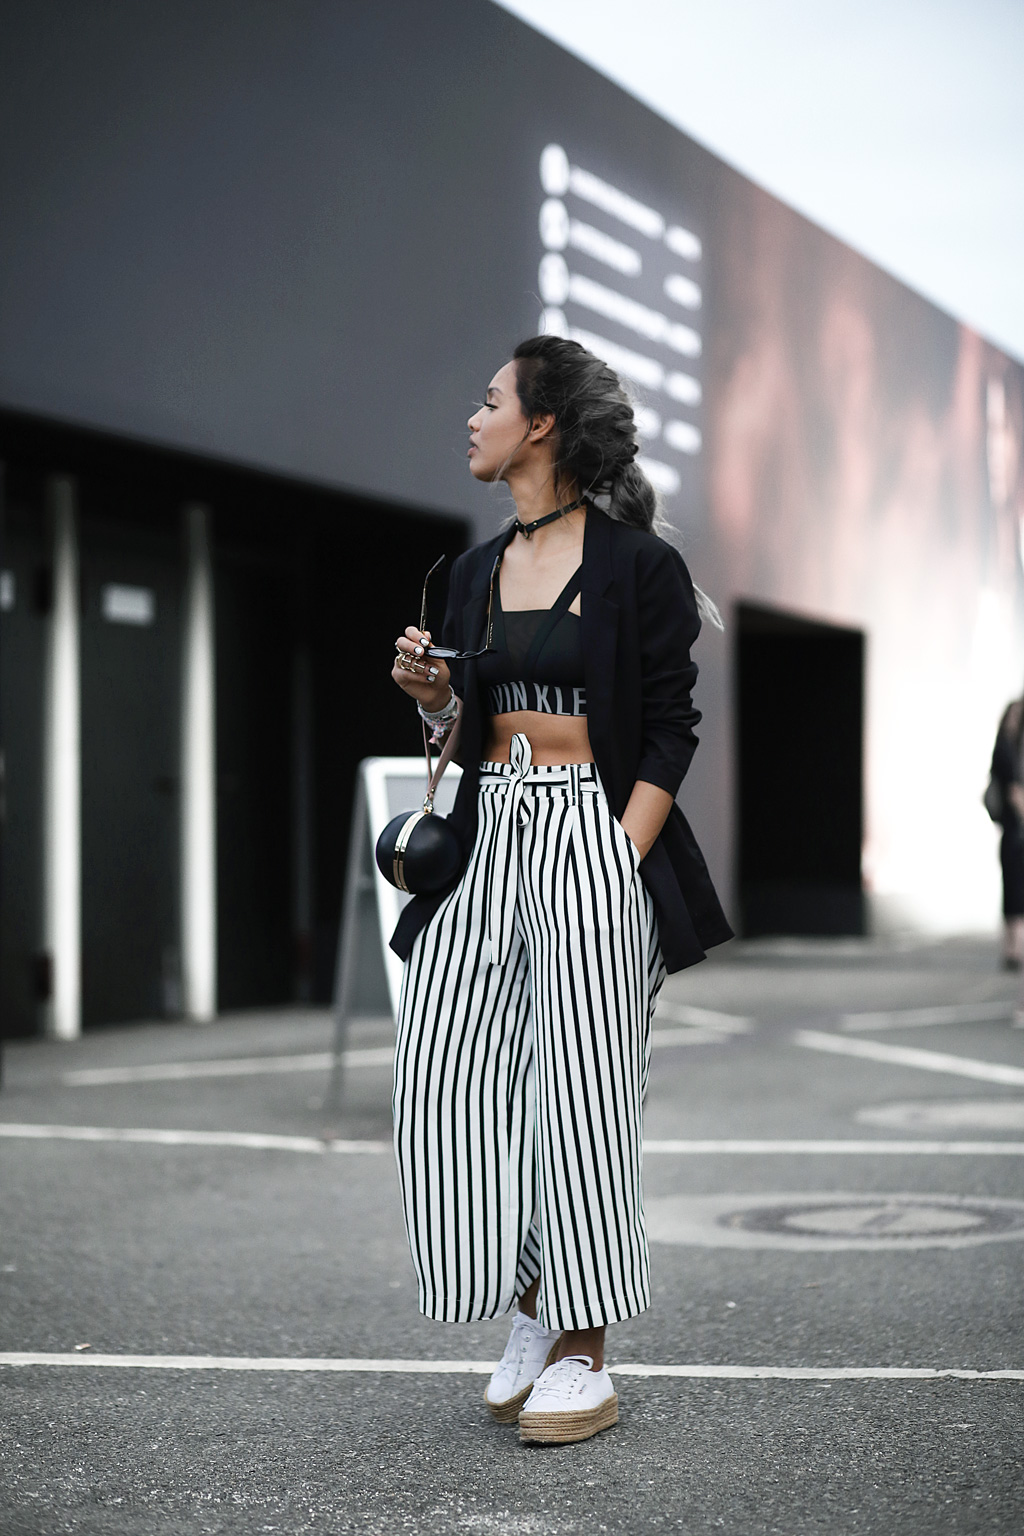 thefashionanarchy_blogger_fashionblogger_modeblog_styleblog_fashionblog_mbfw_berlin_fashionweek_outfit_look_culotte_streifen_sportsbra_superga_muenchen_munich_grannyhair_4